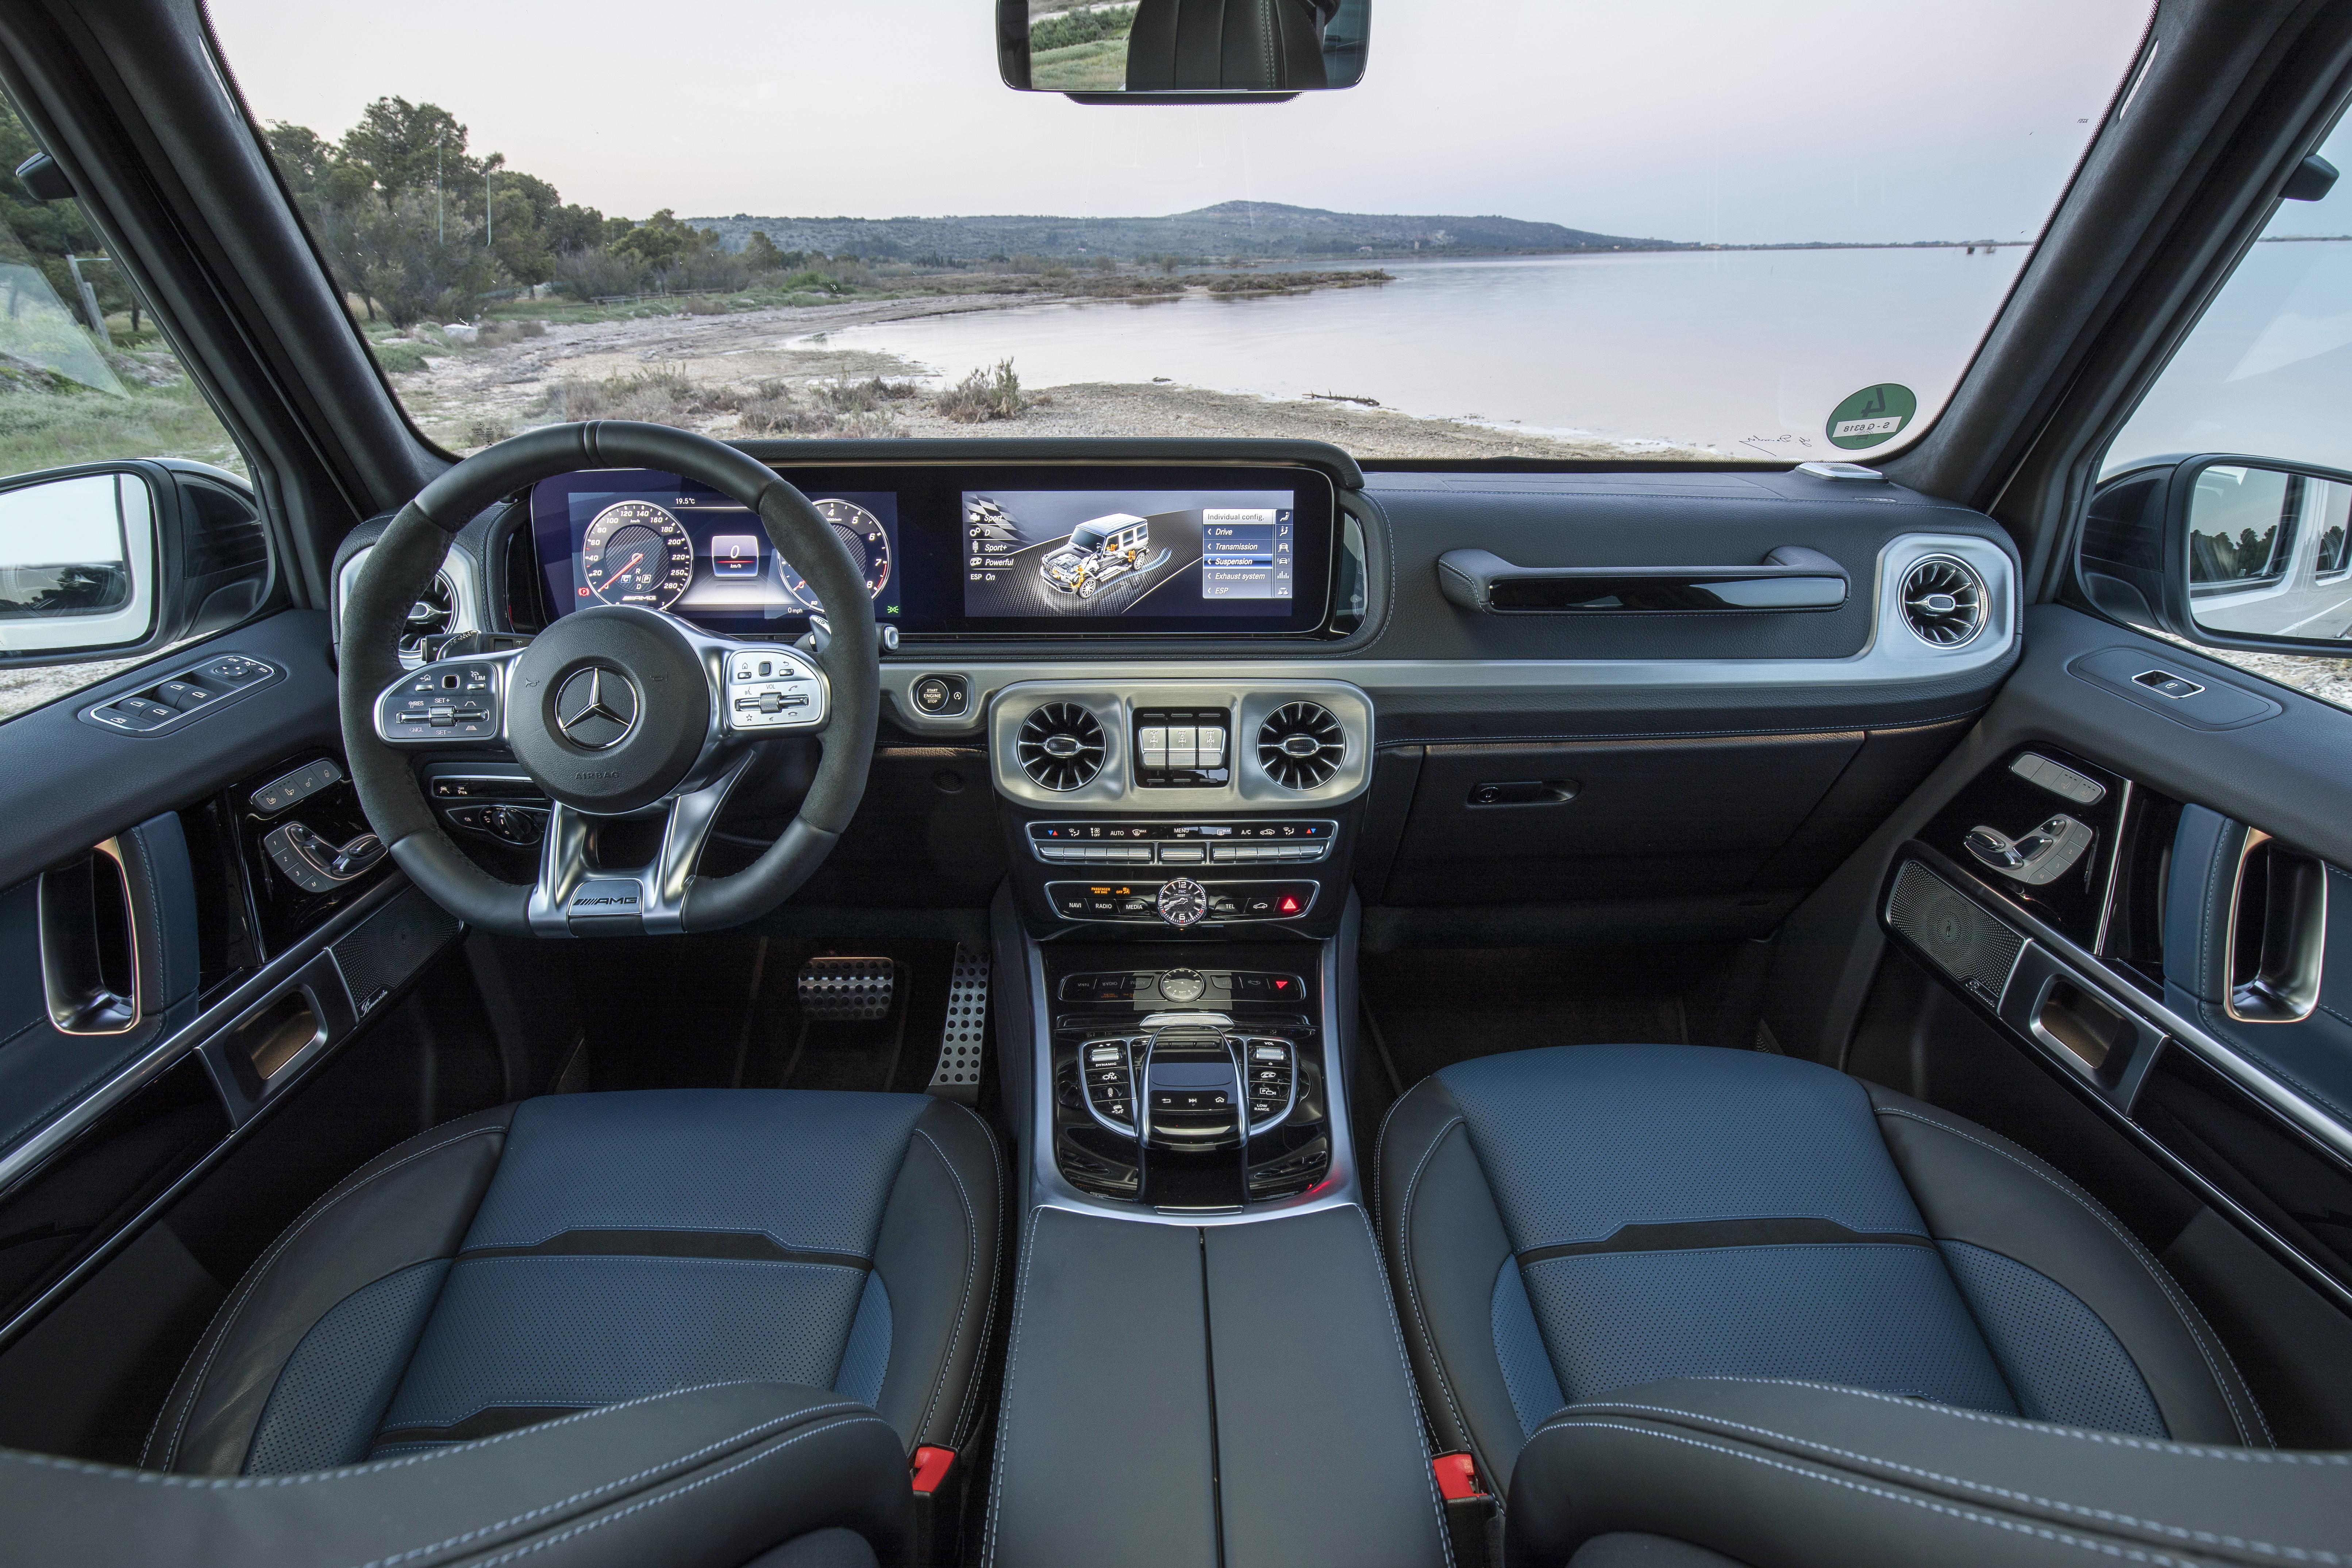 2018 Mercedes-AMG G63.